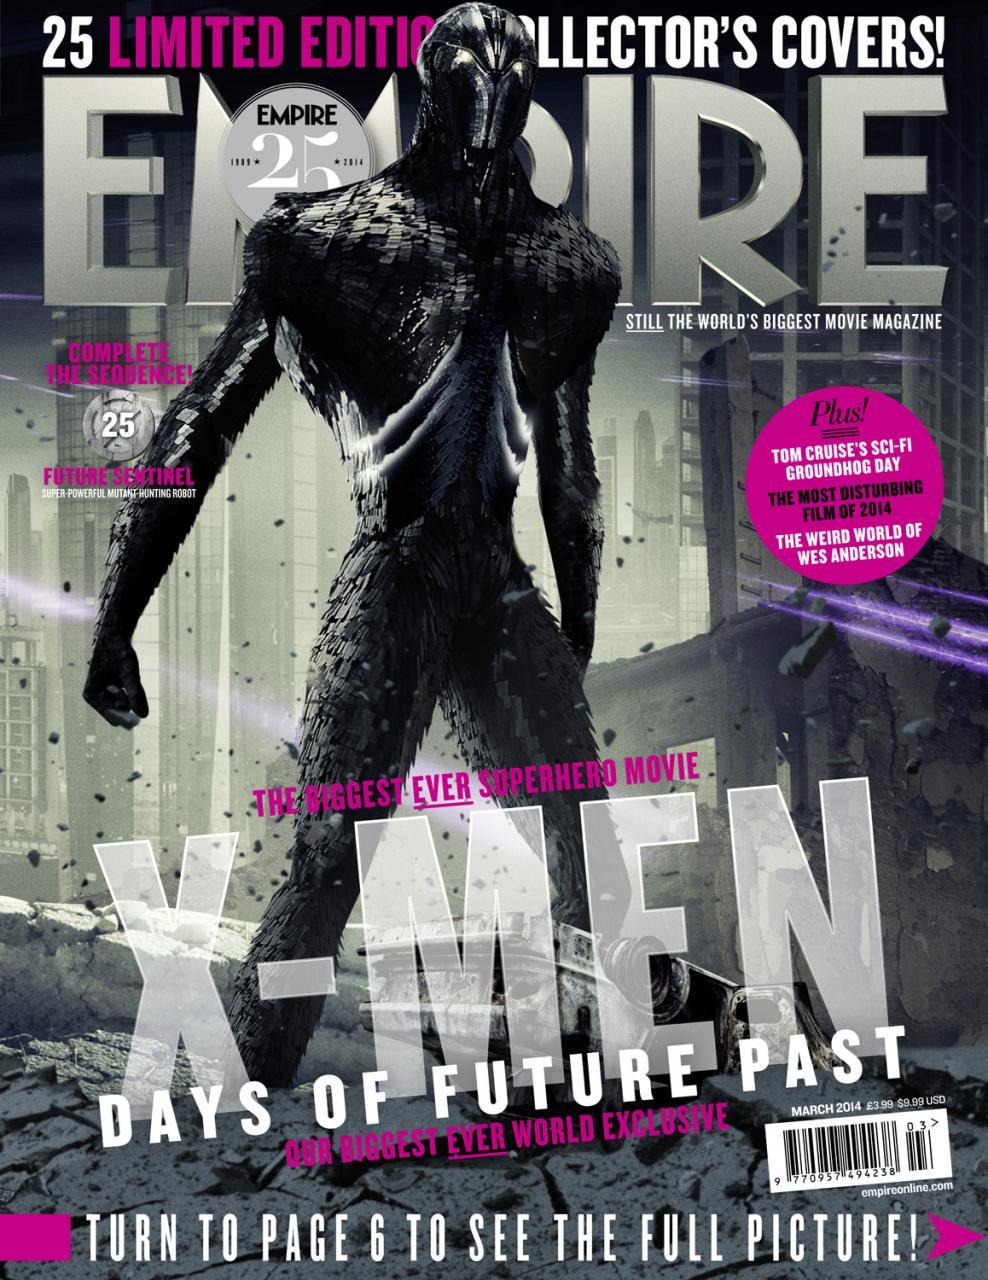 Empire Xmen Days Of Future Past Covers (9)